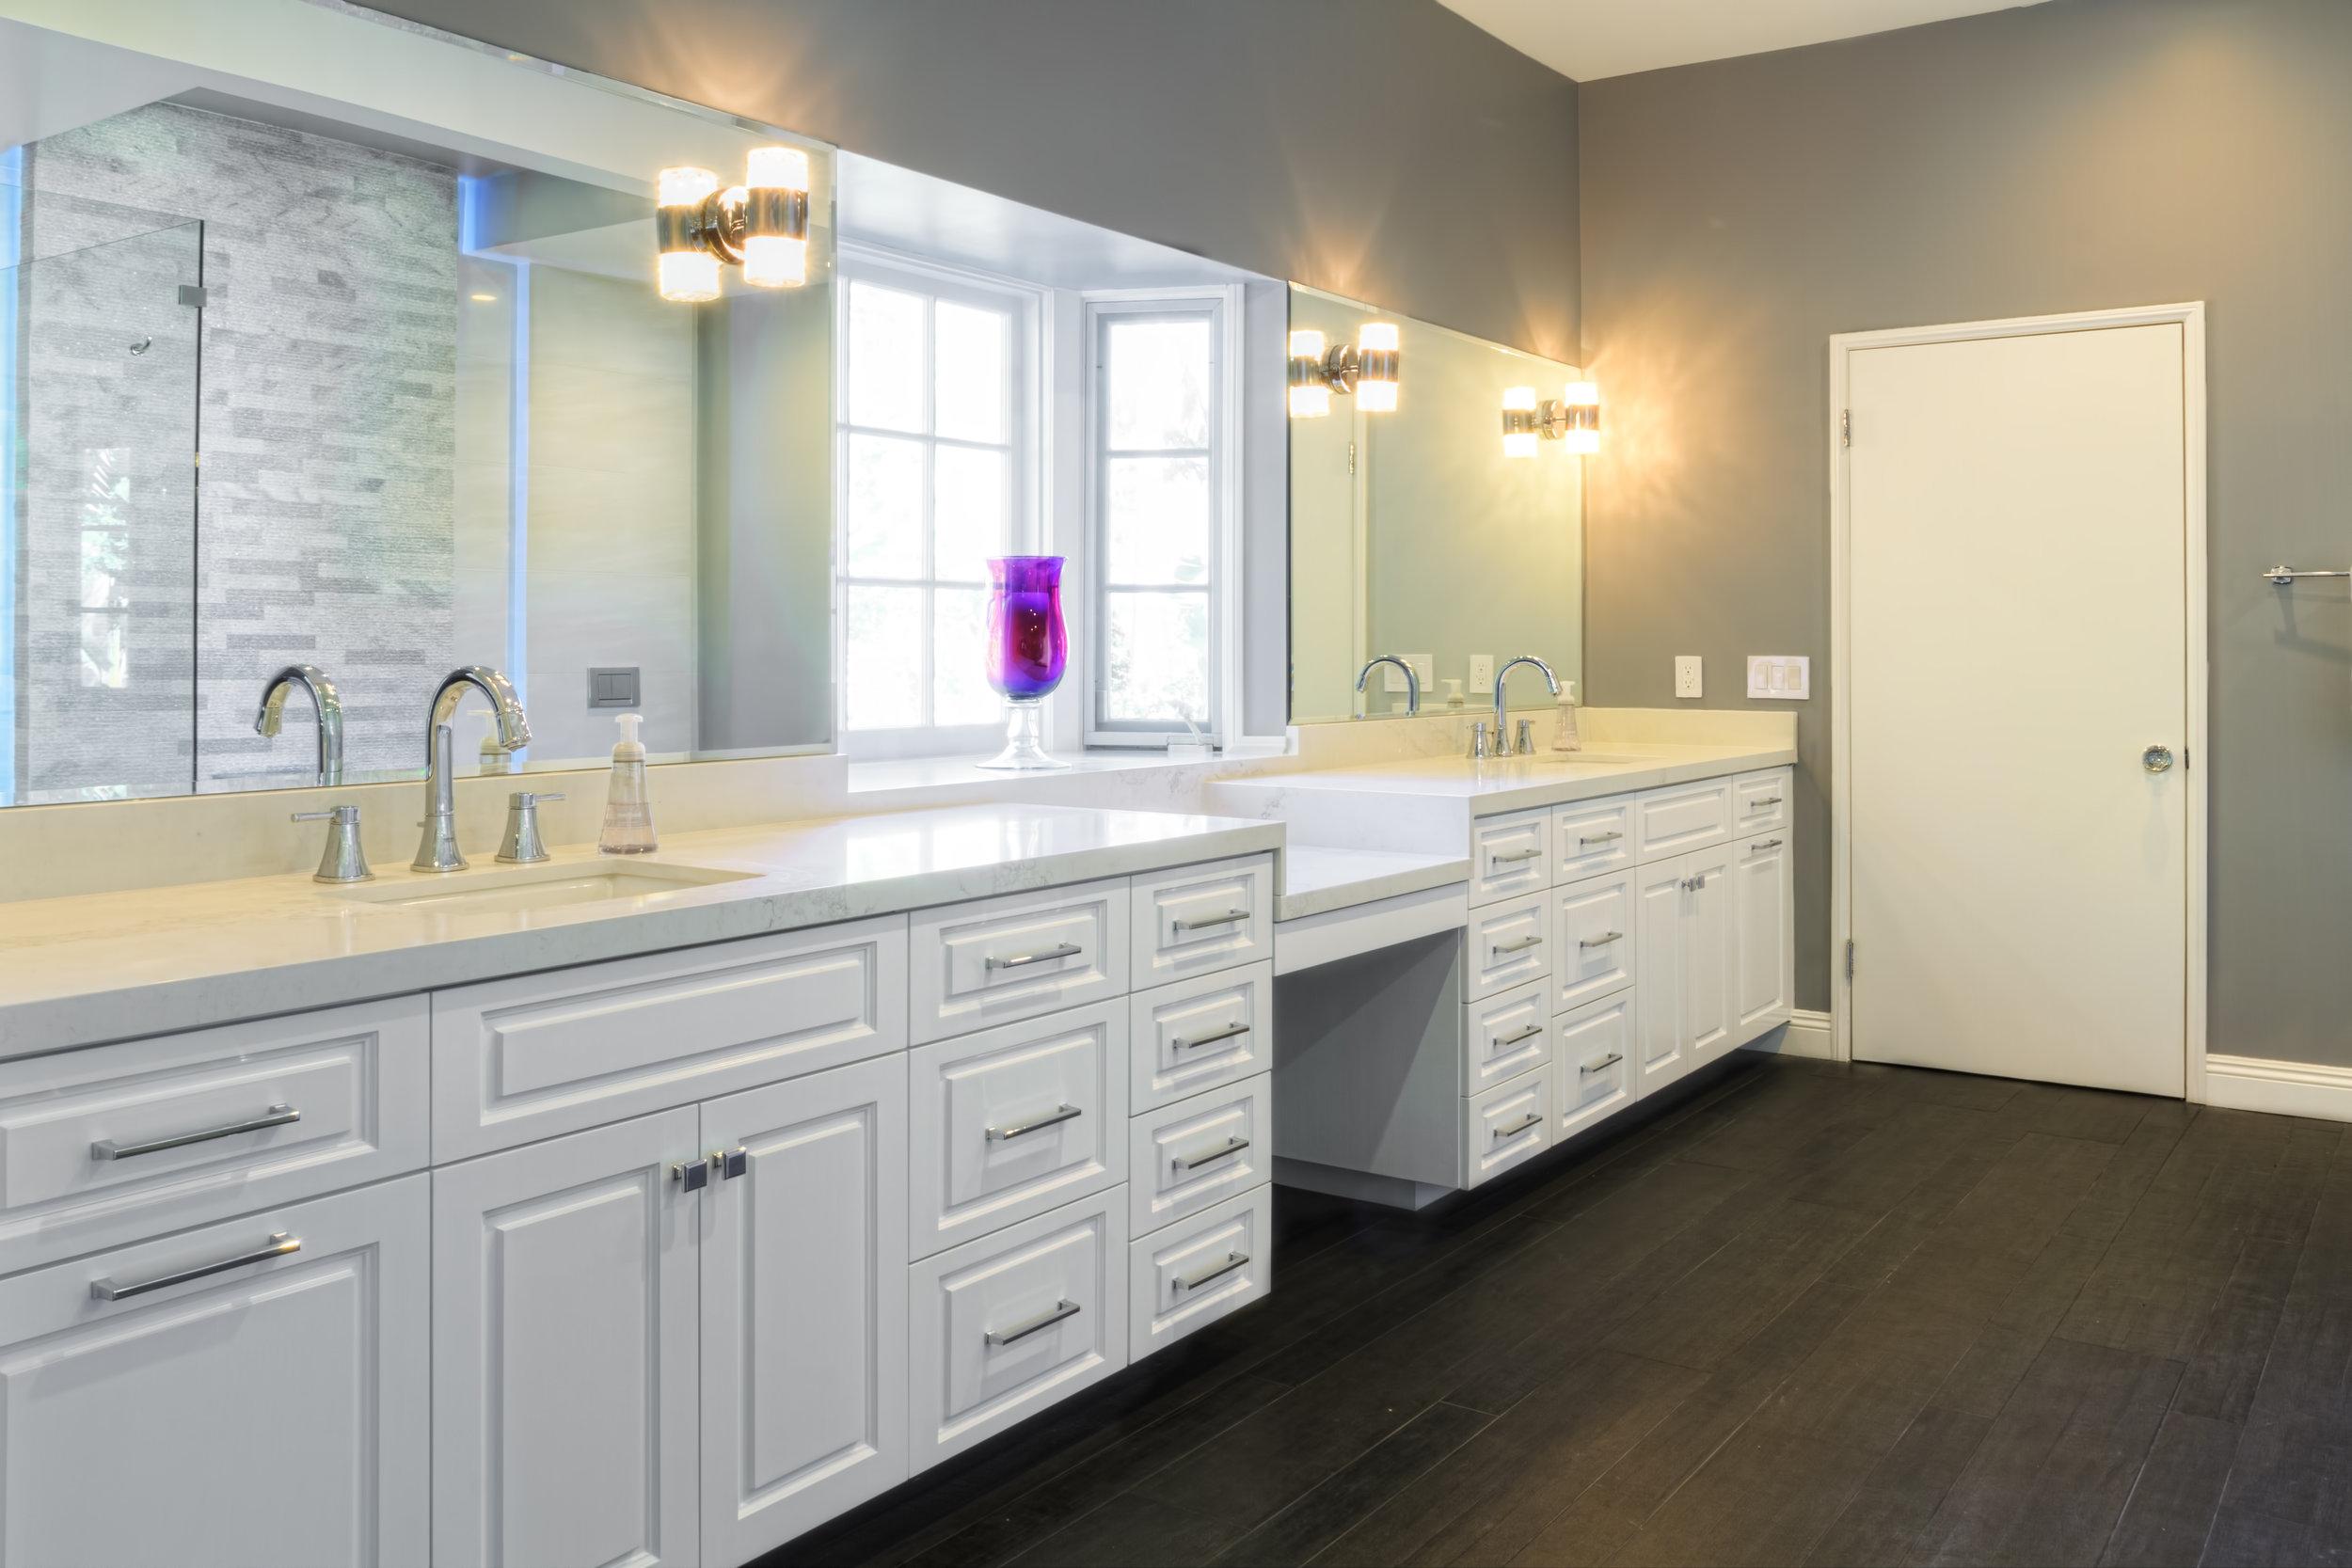 master_bathroom_complete_remodel.jpg